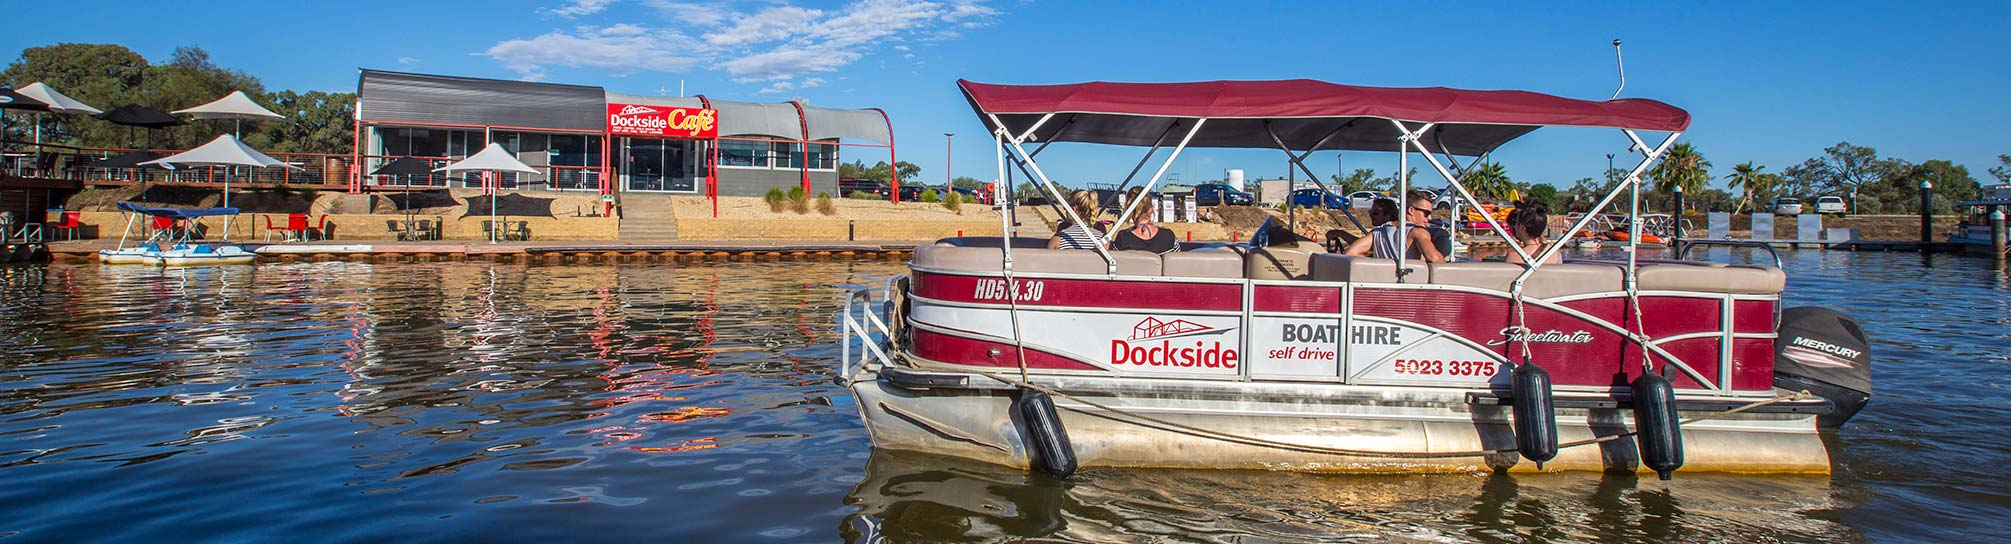 Pontoon Boats Cover Photo